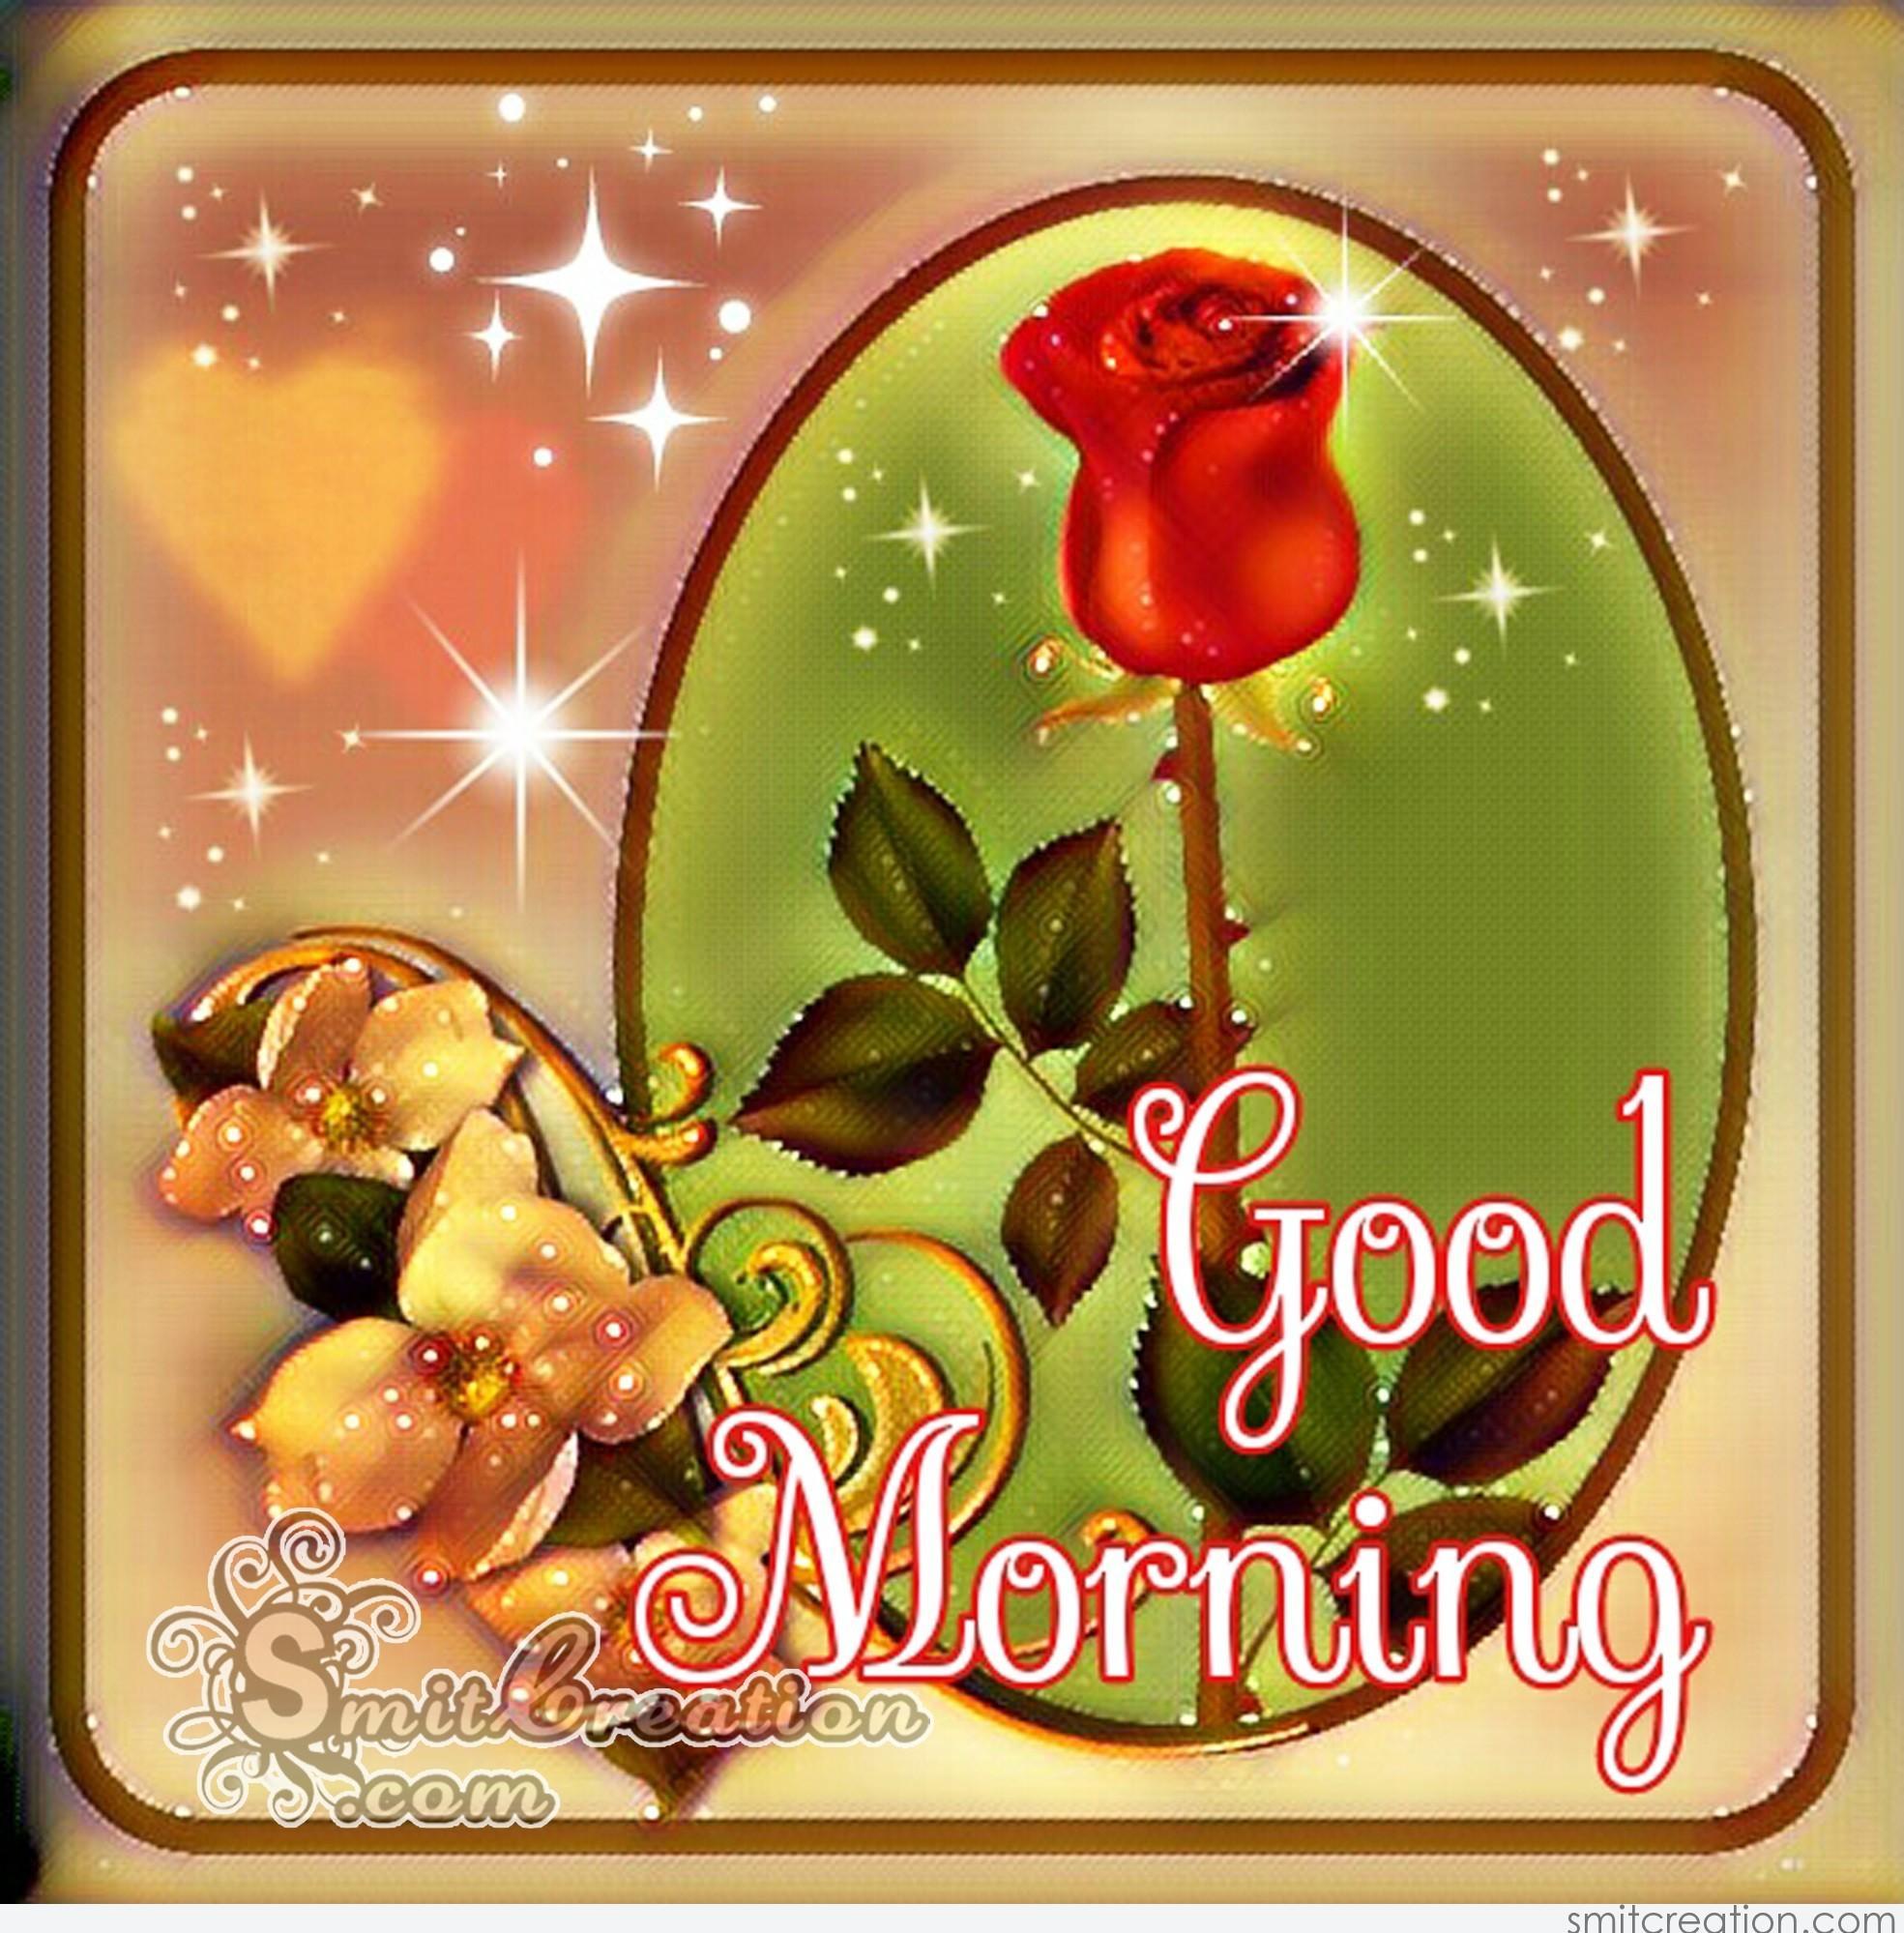 Good Morning Roses Download : Good morning rose flower smitcreation